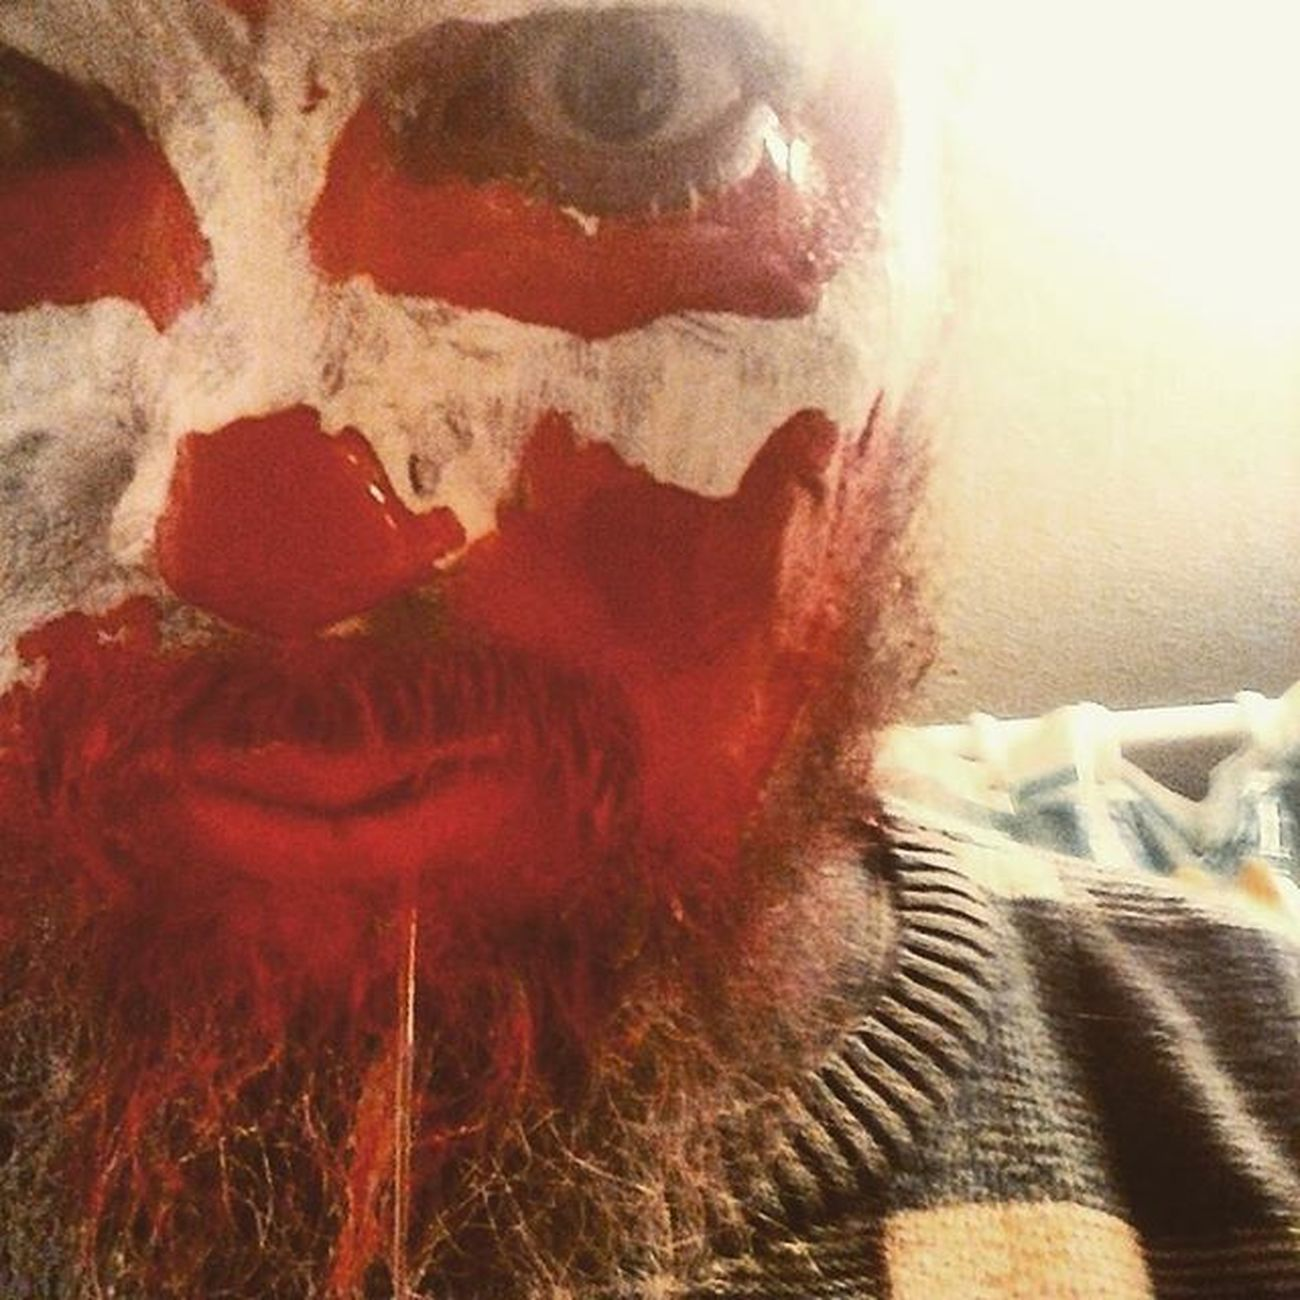 Tasty Dead. Selfie Halloween Facepaint BLOODY Whoopwhoop Mcl Producer Artist Emcee Horrorcore Horror